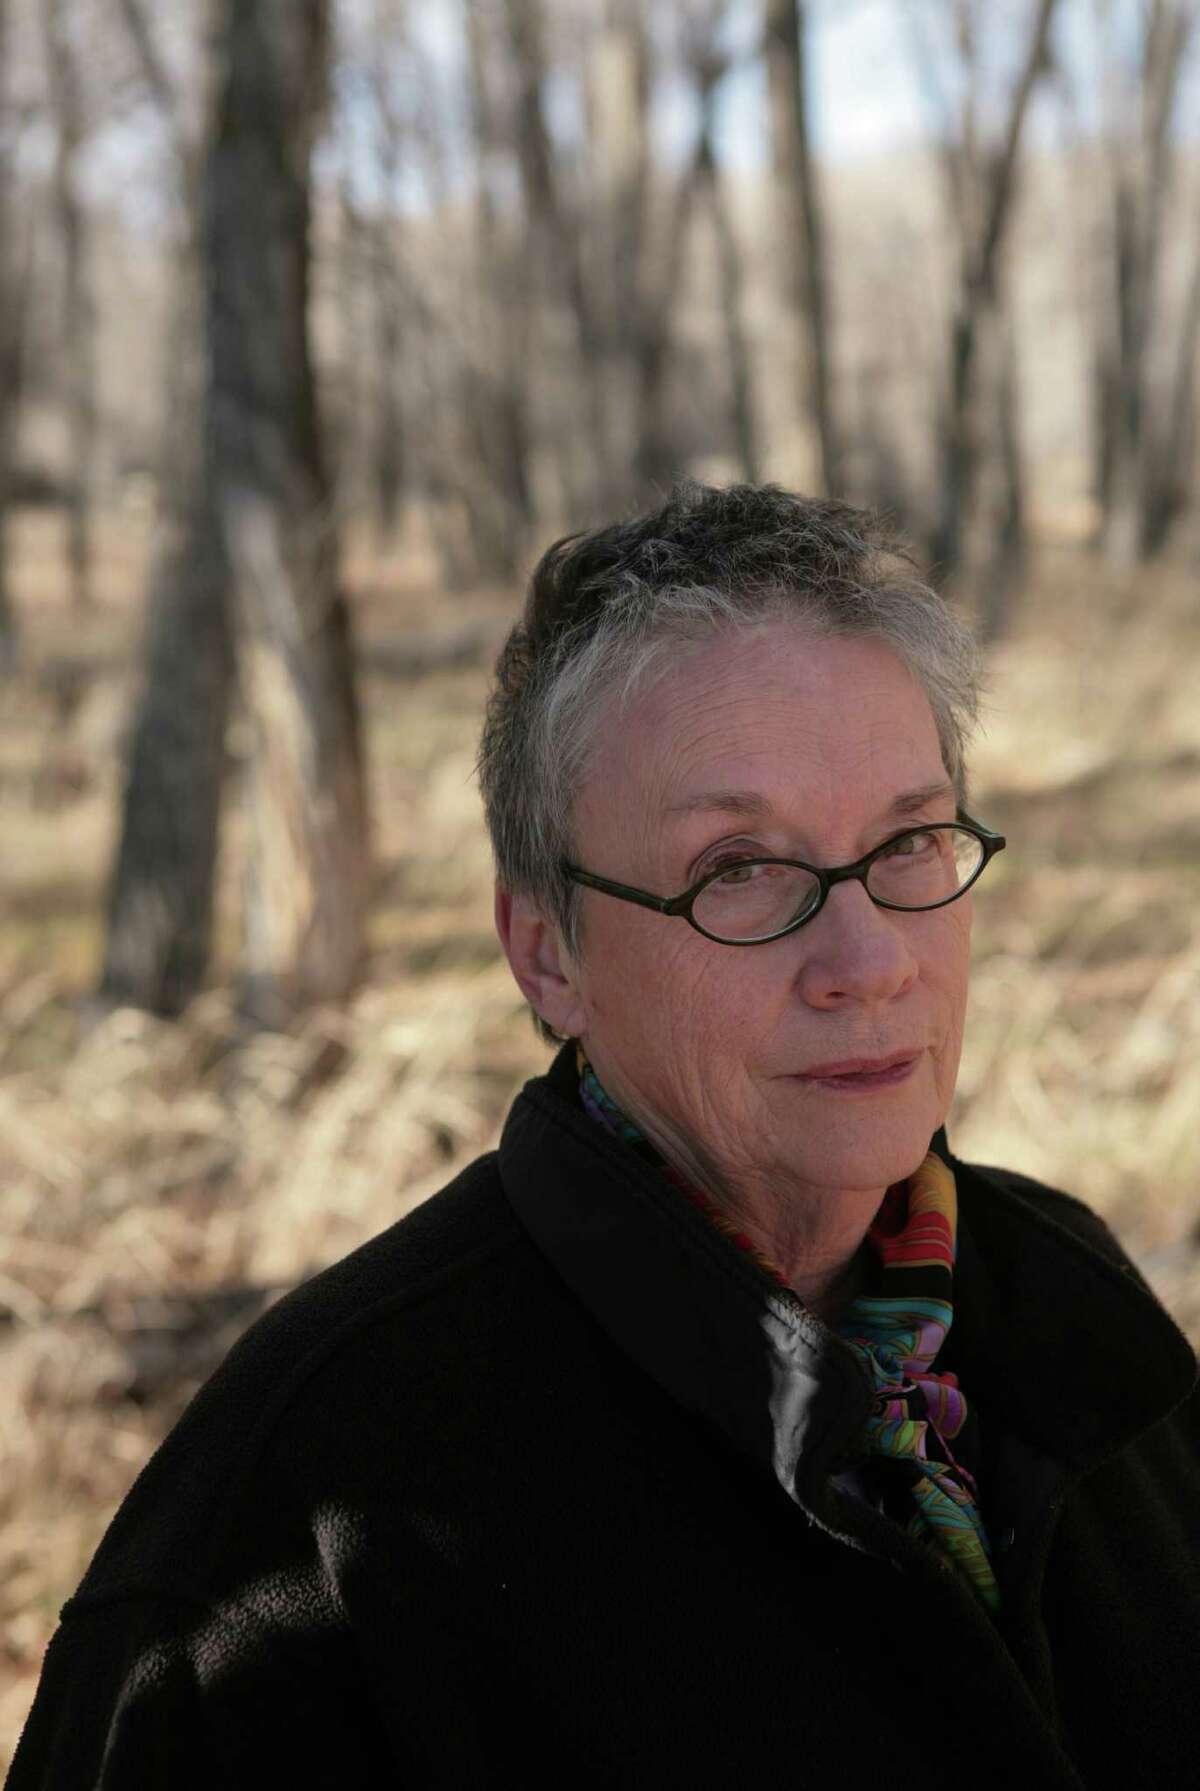 When novelist Annie Proulx read